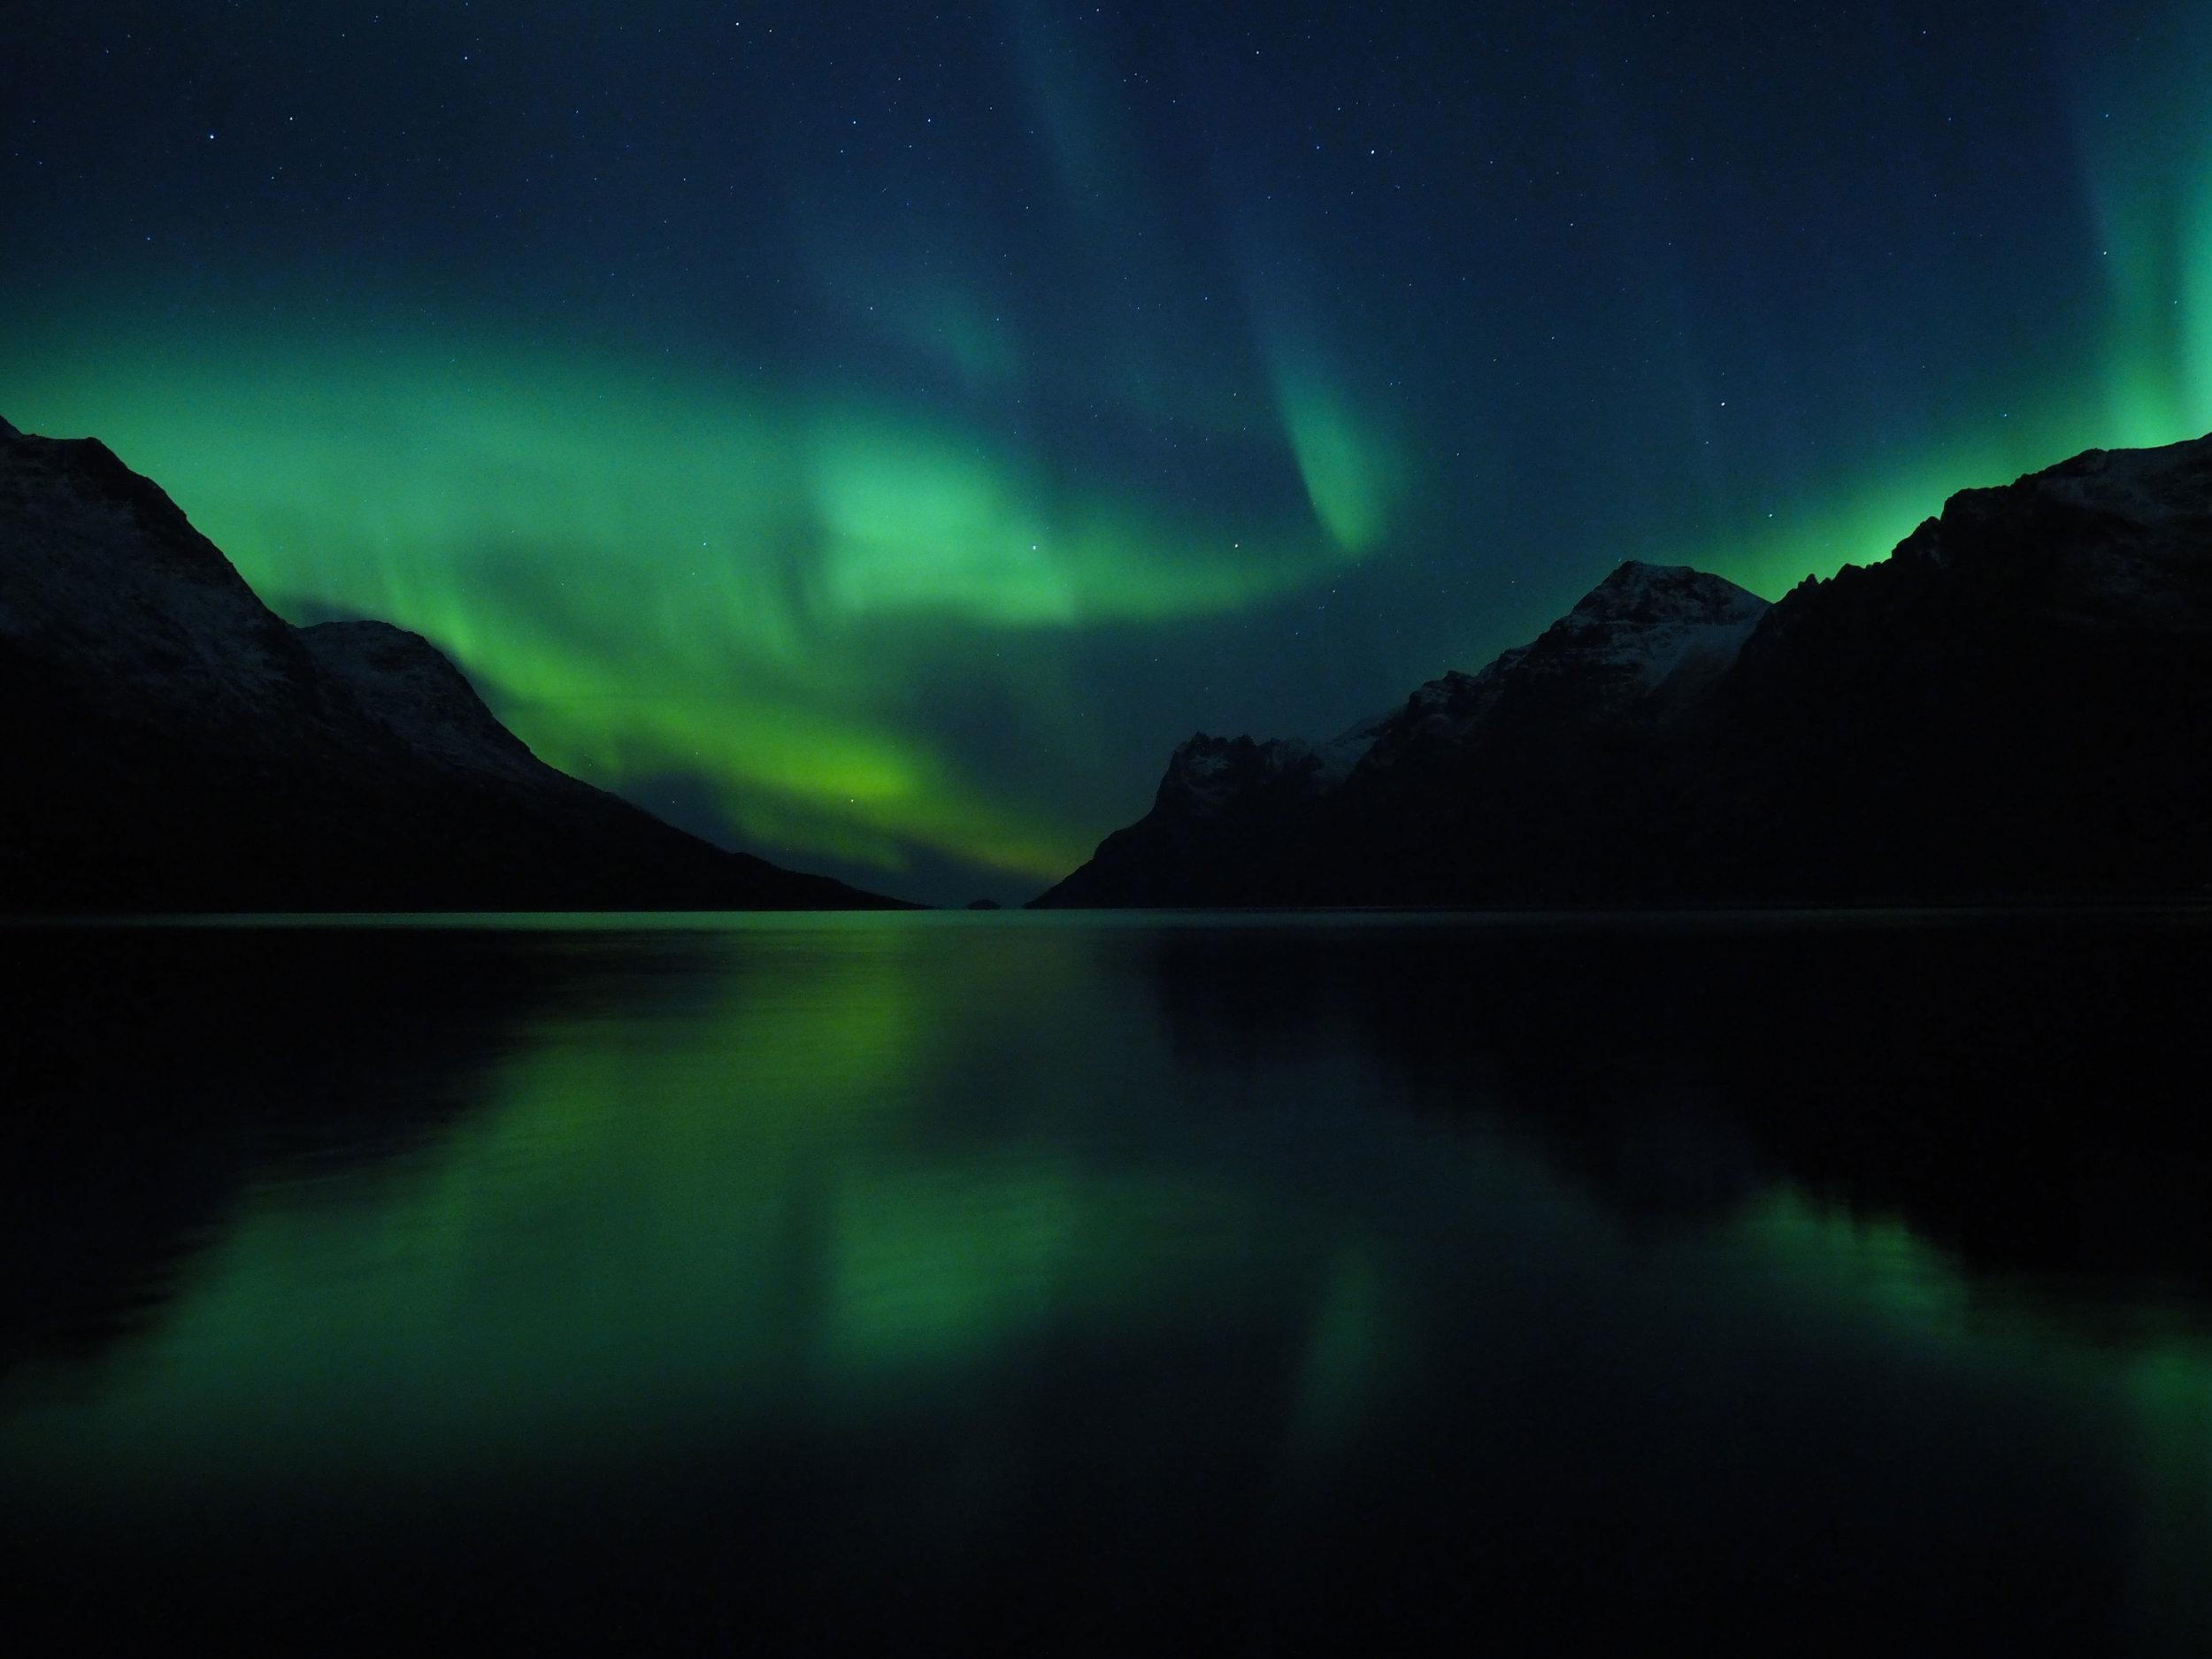 Aurora-borealis,-Northern-lights,-North-Norway_Lea-Ponzle.jpg